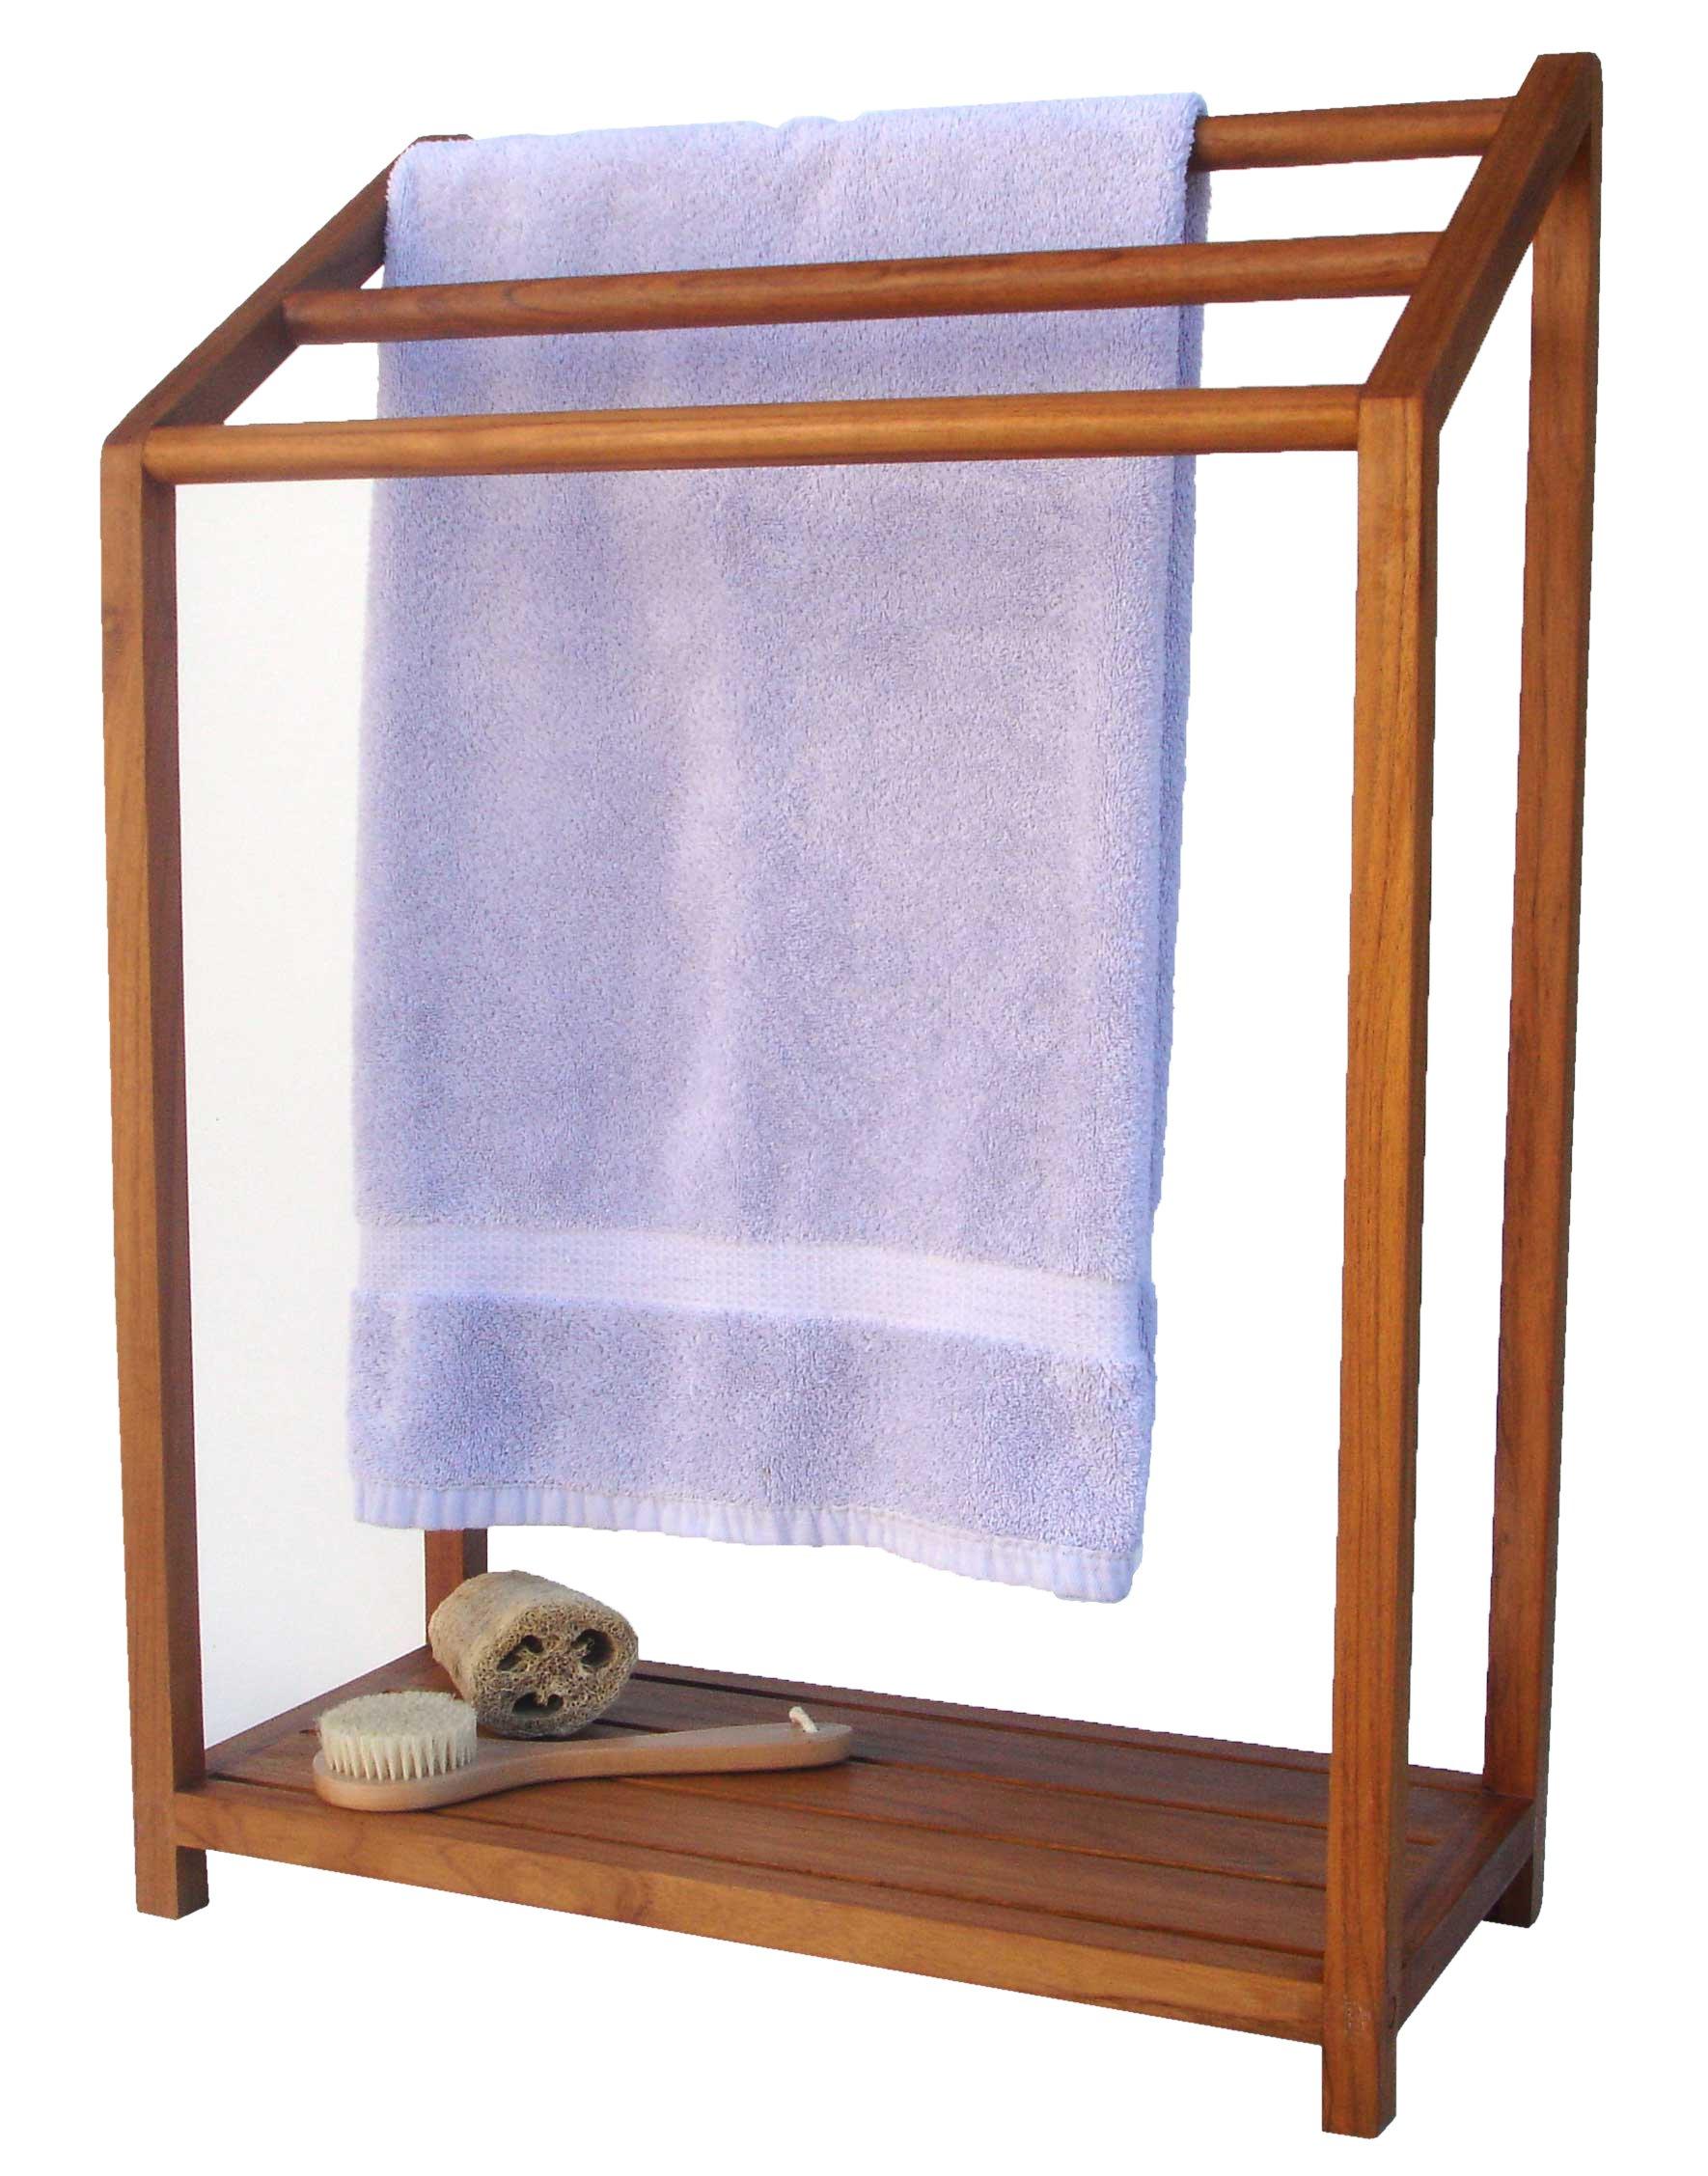 AquaTeak Scratch & Dent - The Original Sula Versatile Teak Towel Rack